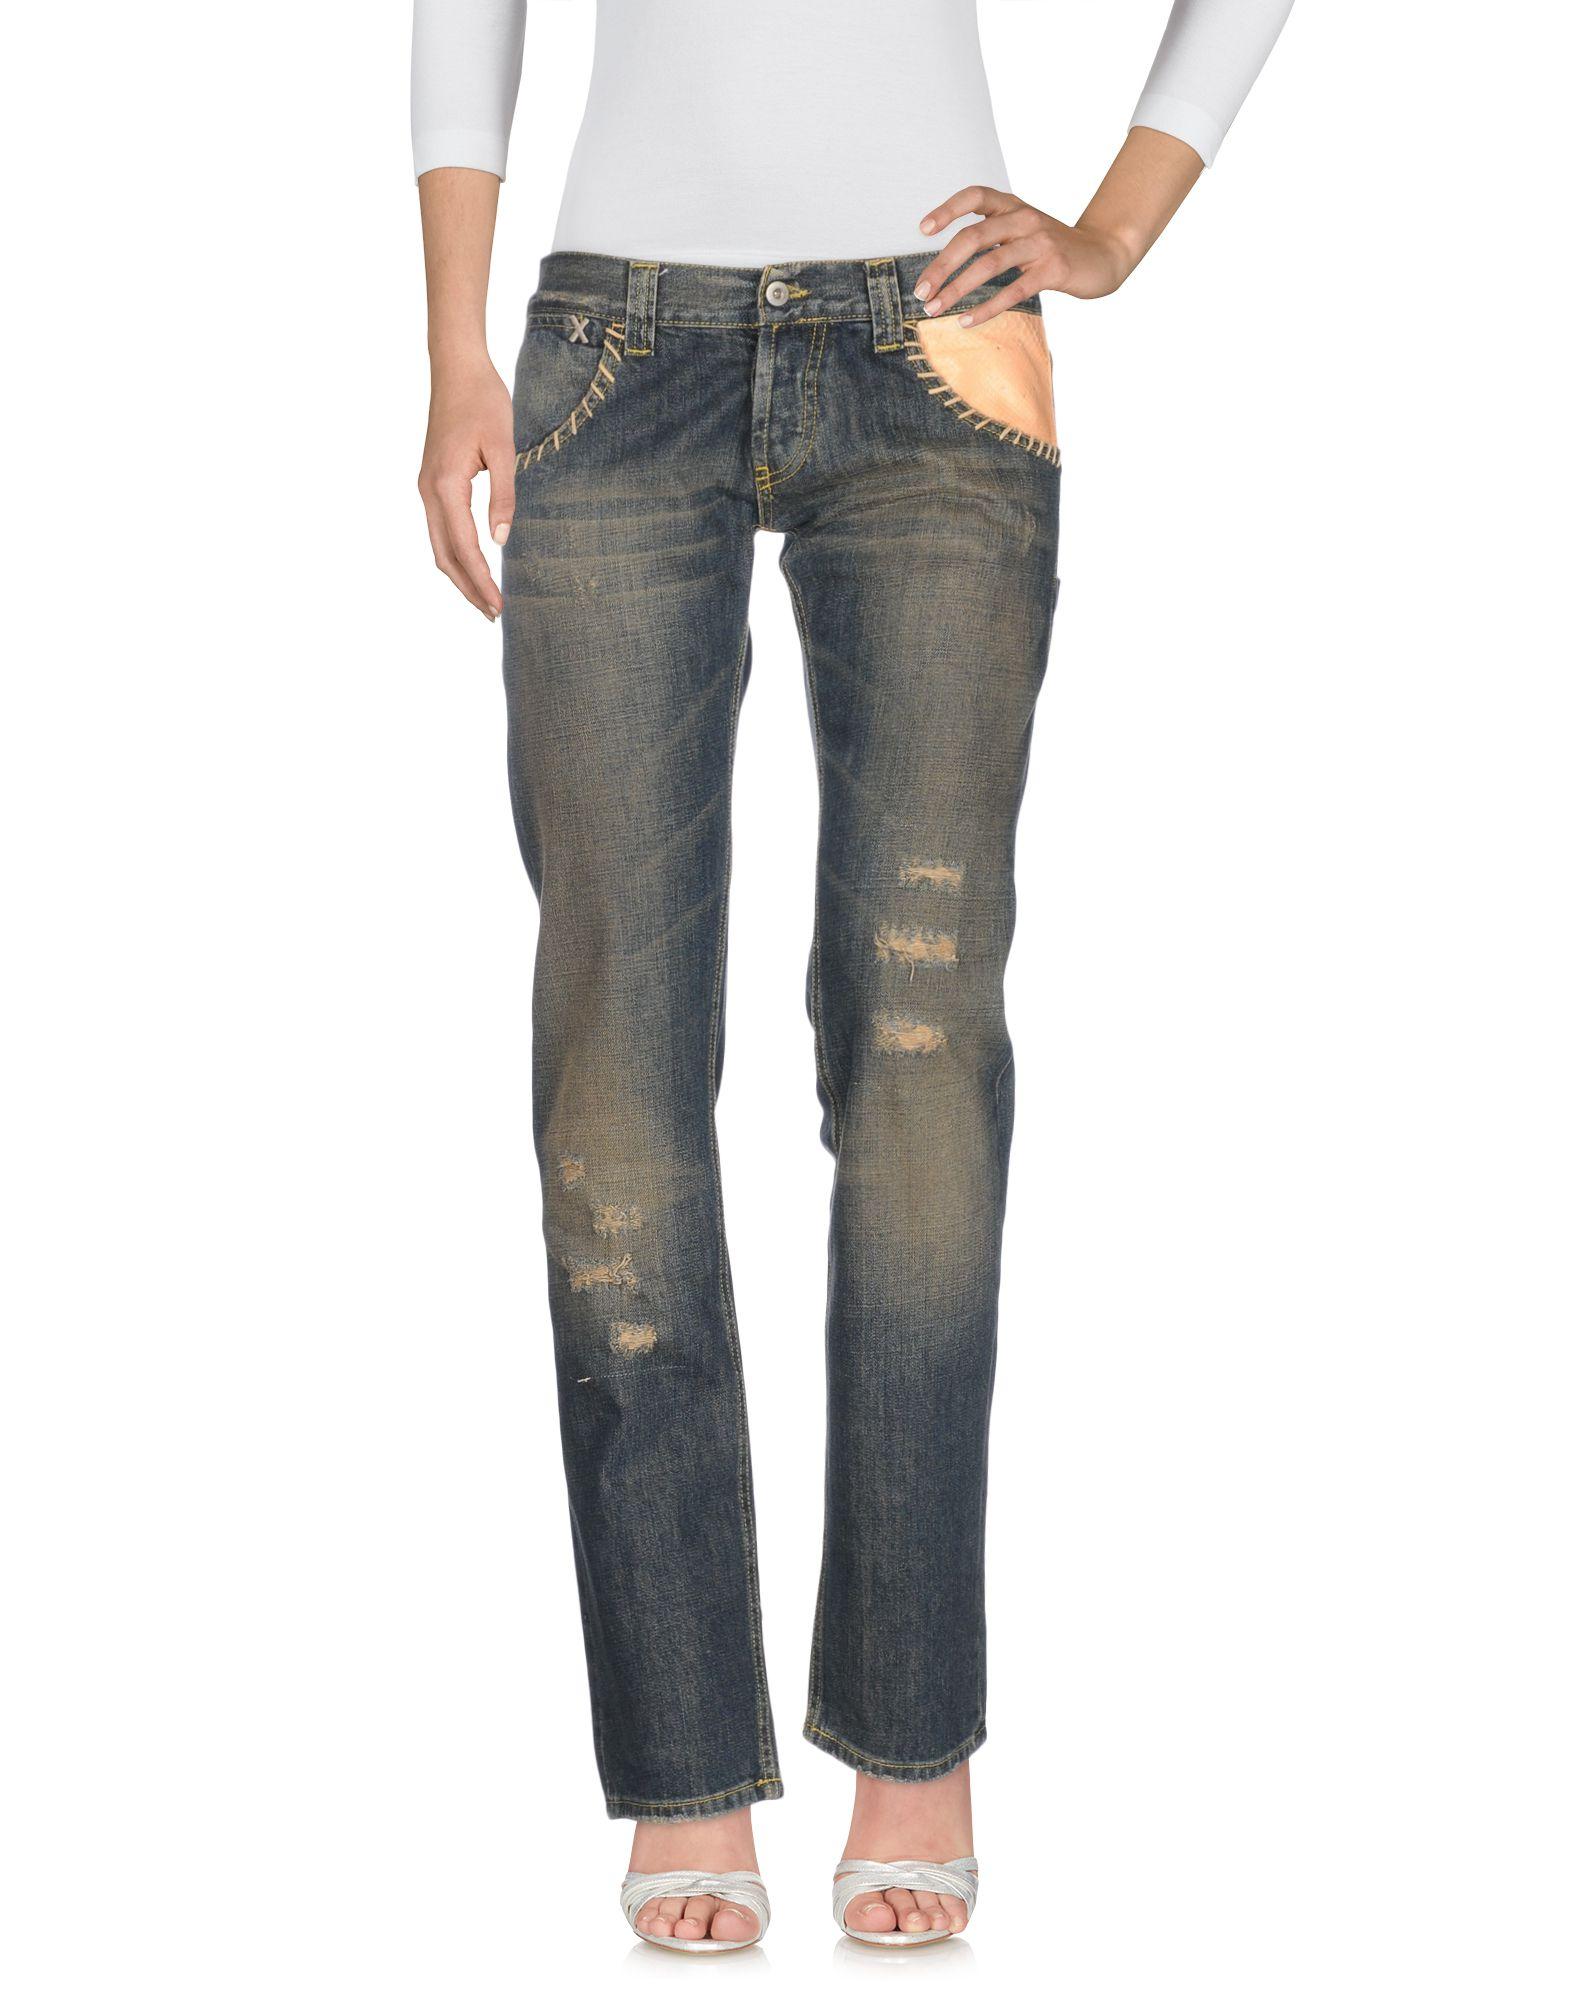 MONICA BIANCO Damen Jeanshose Farbe Blau Größe 5